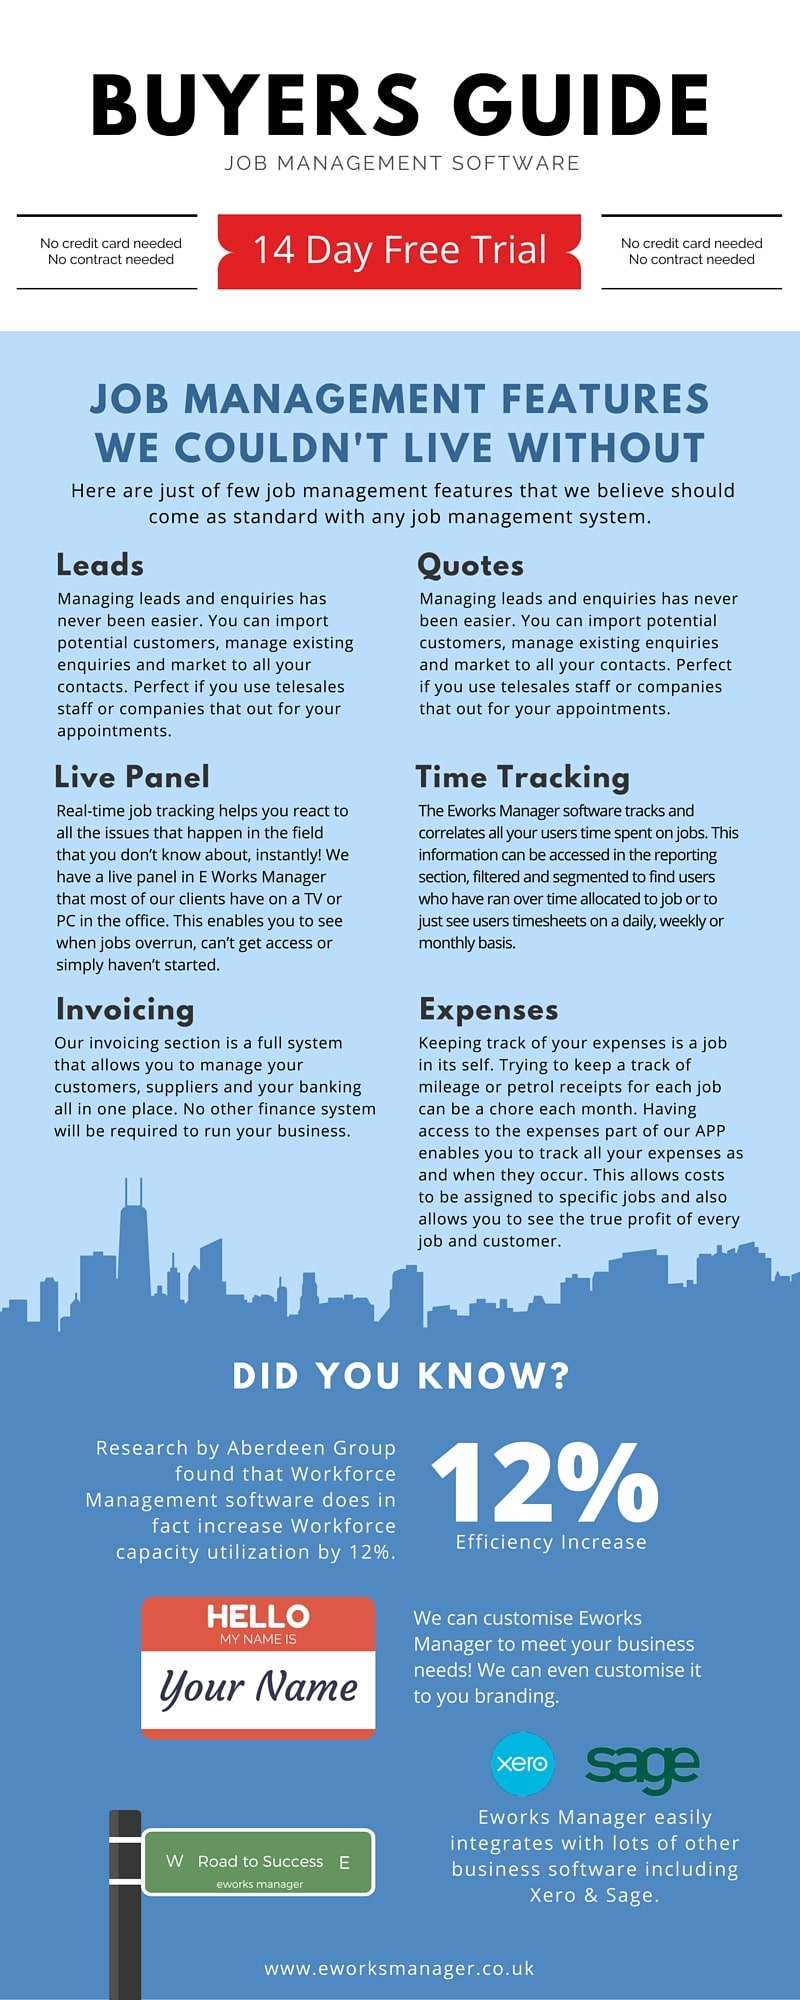 Buyers Guide: Job Management Software